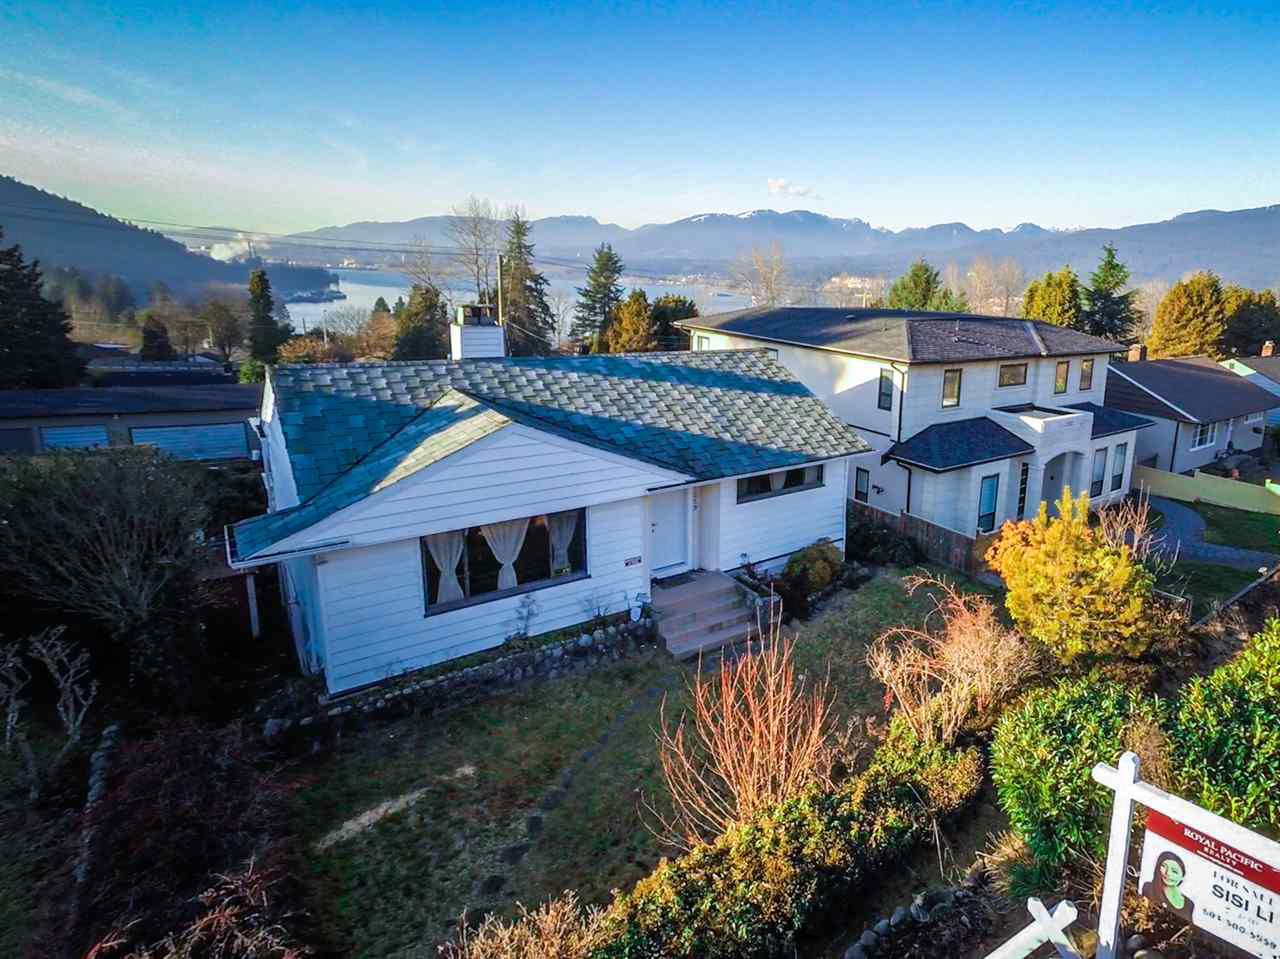 Main Photo: 7259 BARNET ROAD in Burnaby: Westridge BN House for sale (Burnaby North)  : MLS®# R2024693